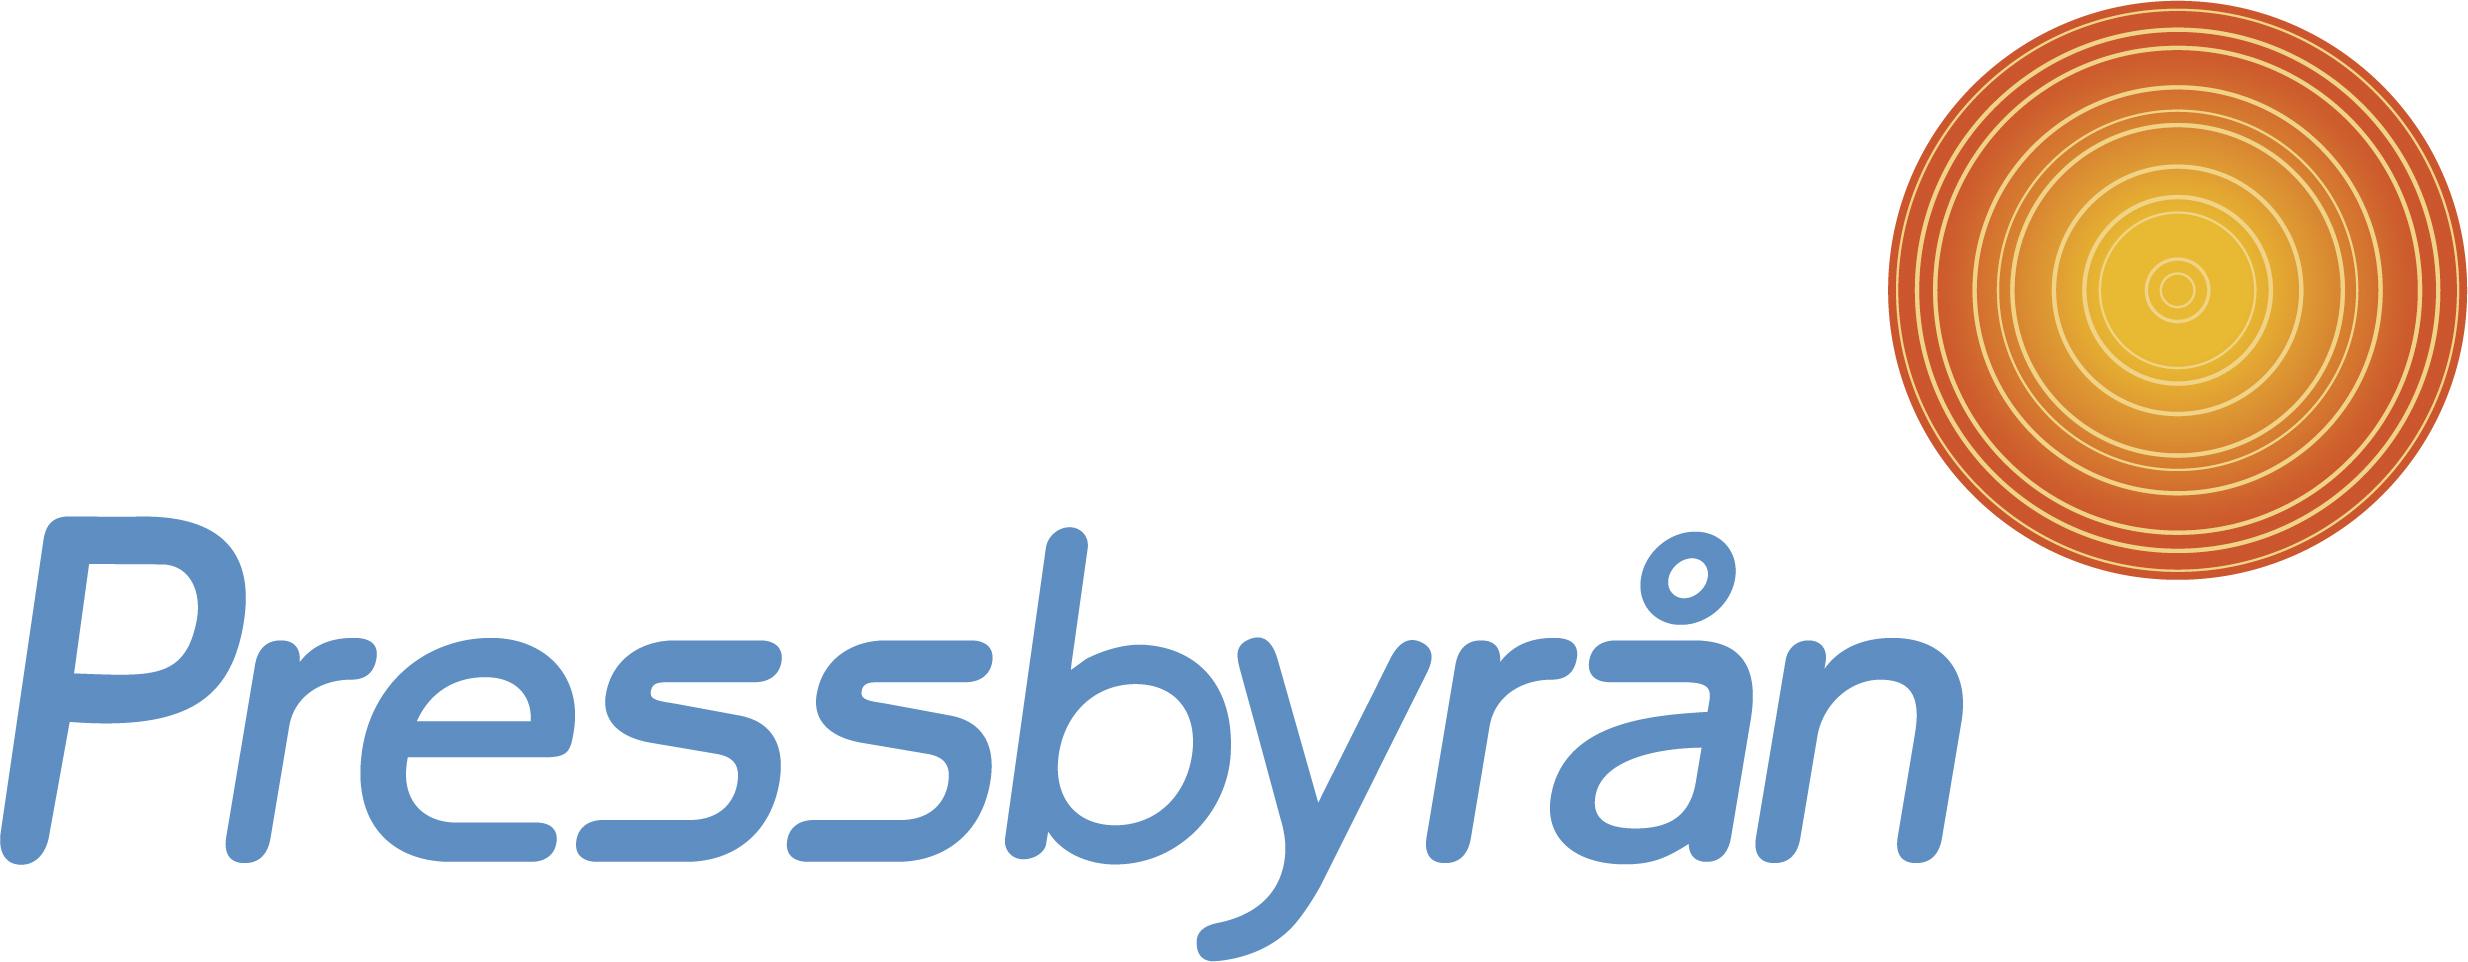 Pressbyråns logotype